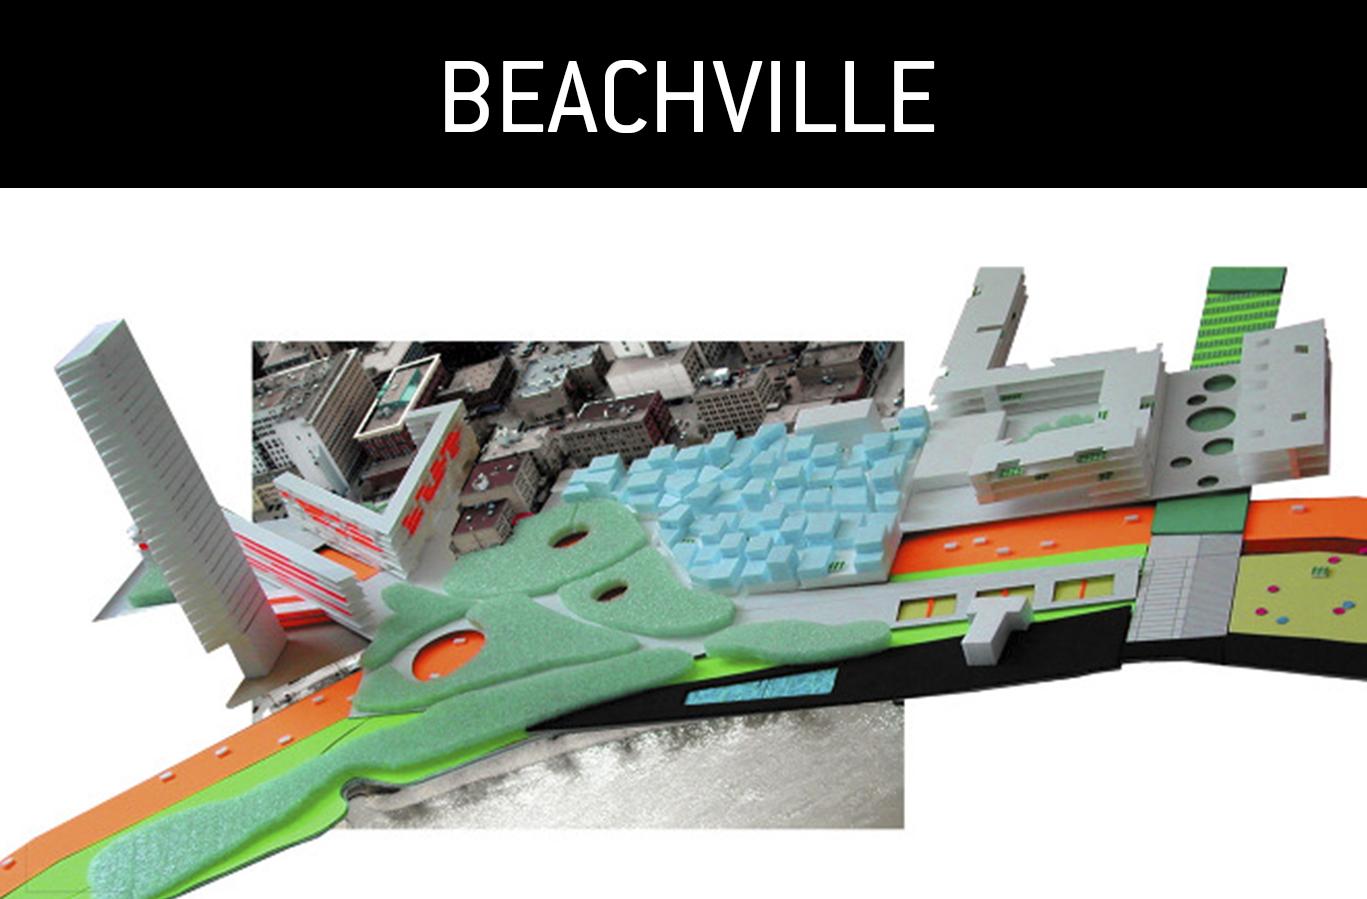 beachville thumb.jpg